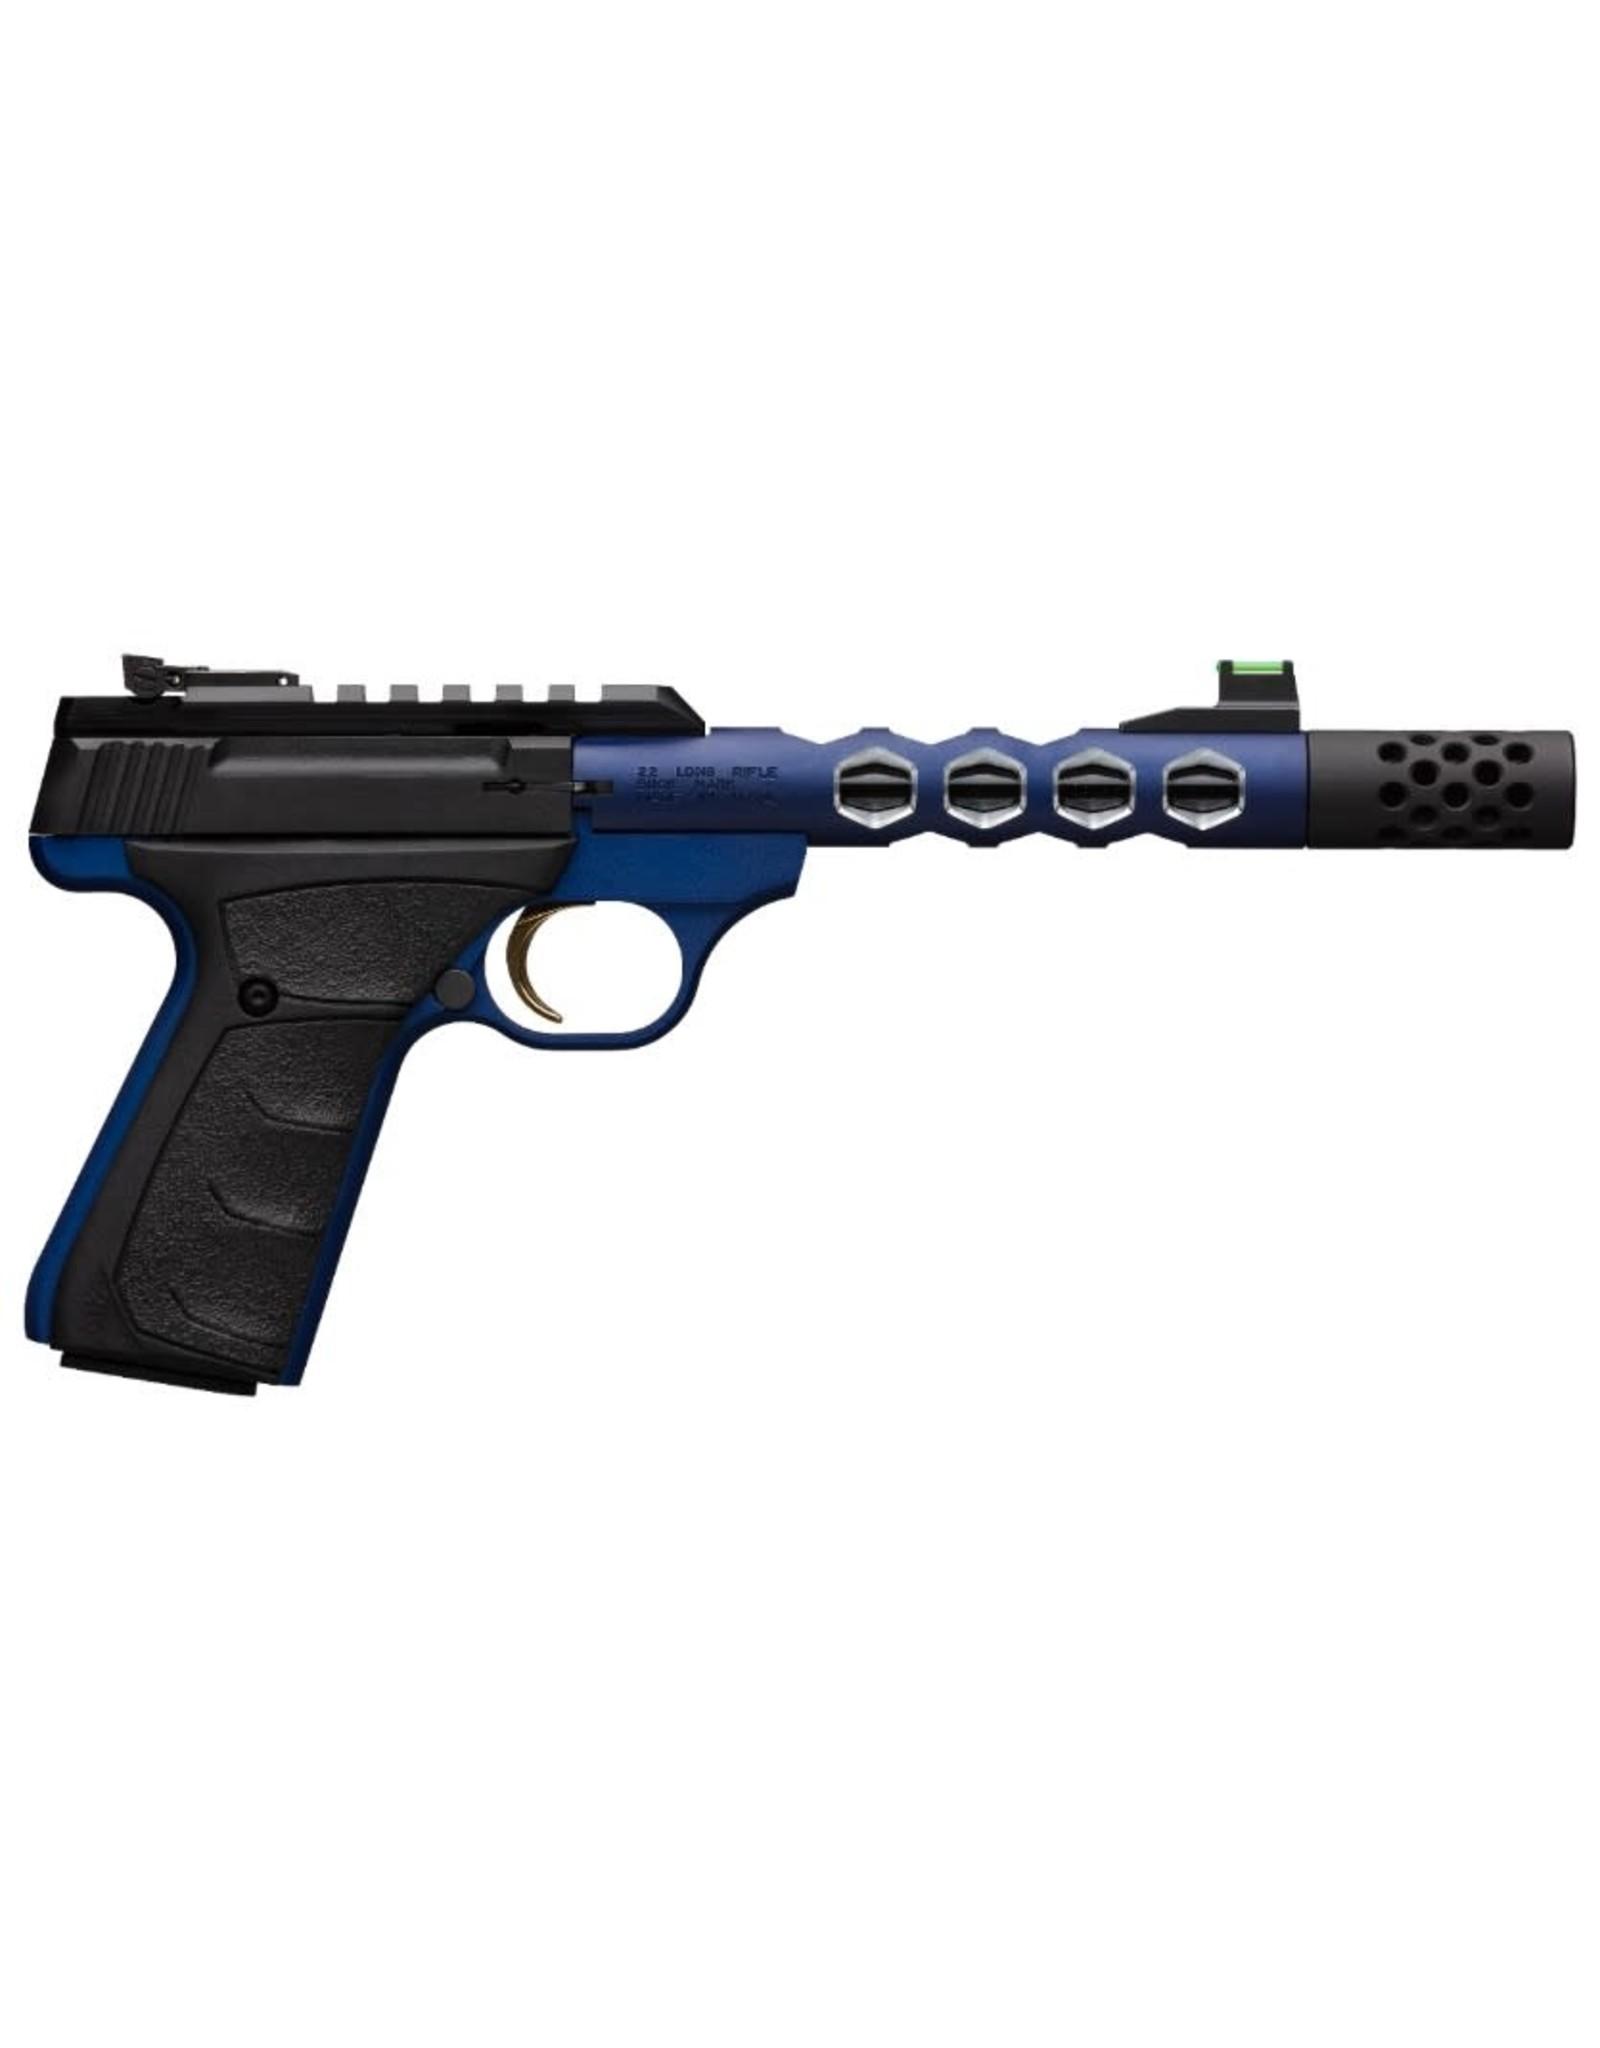 "Browning Buckmark Plus Vision UFX Blue .22 LR 5.5"" bbl 10+1 Round"